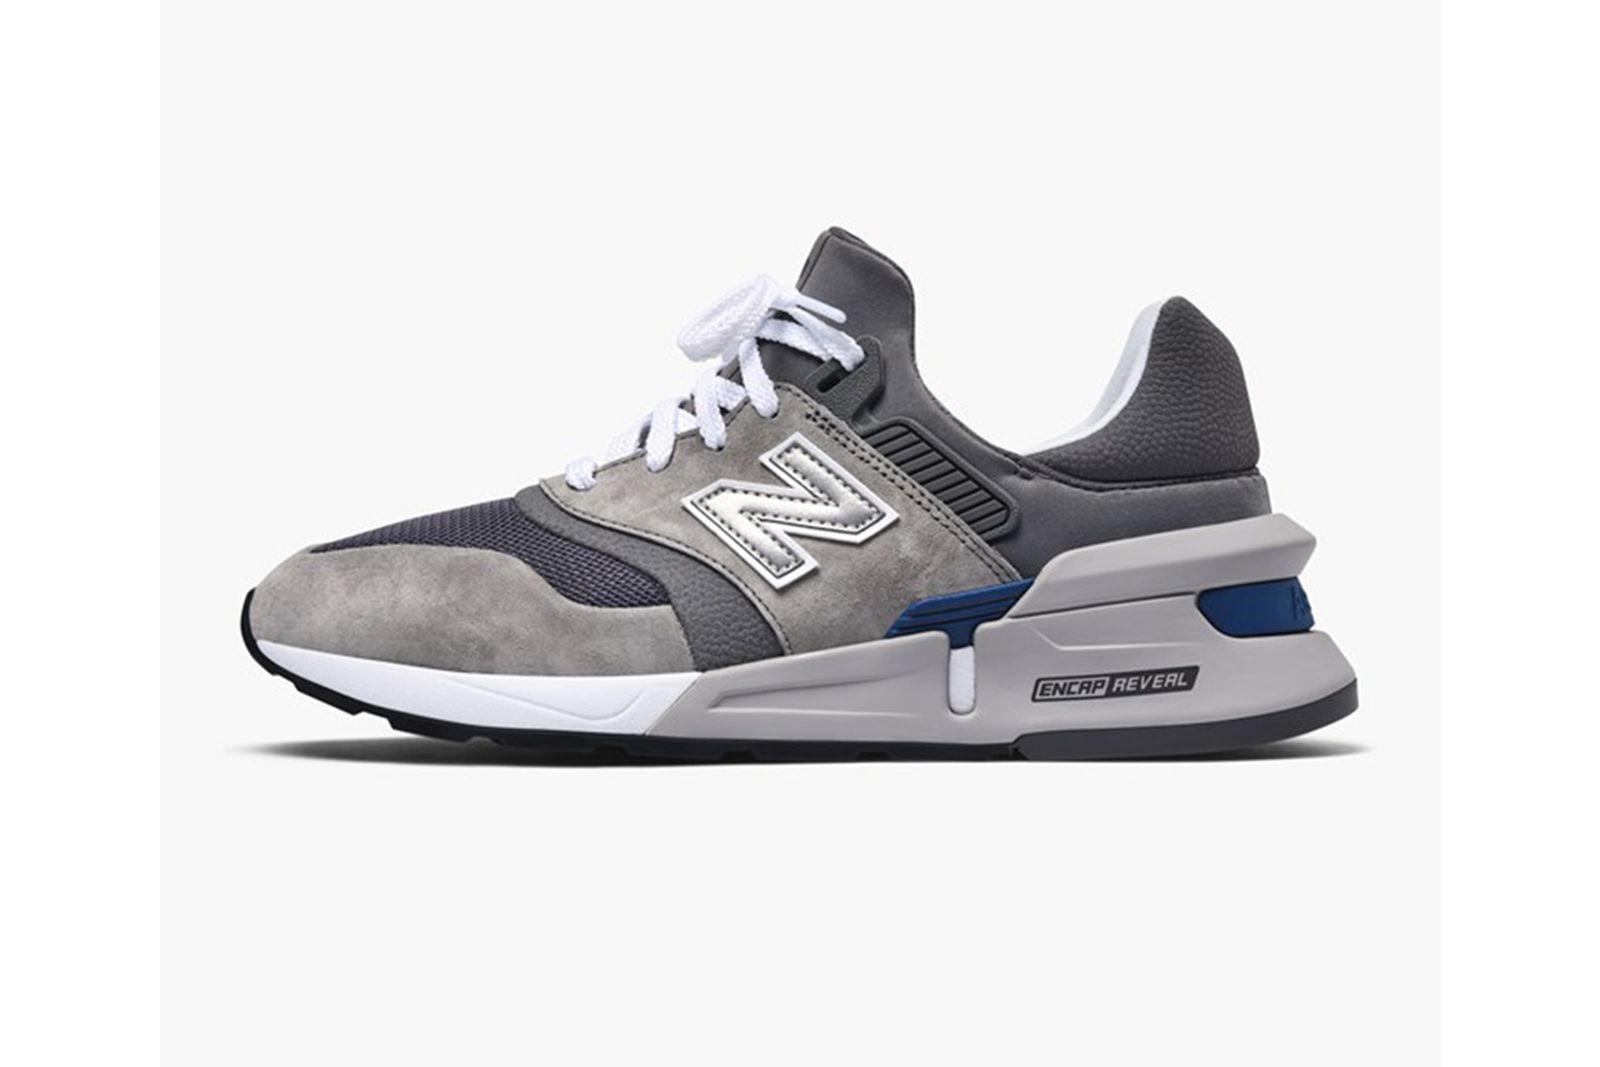 caliroots new balance ms997hgc sneaker sales